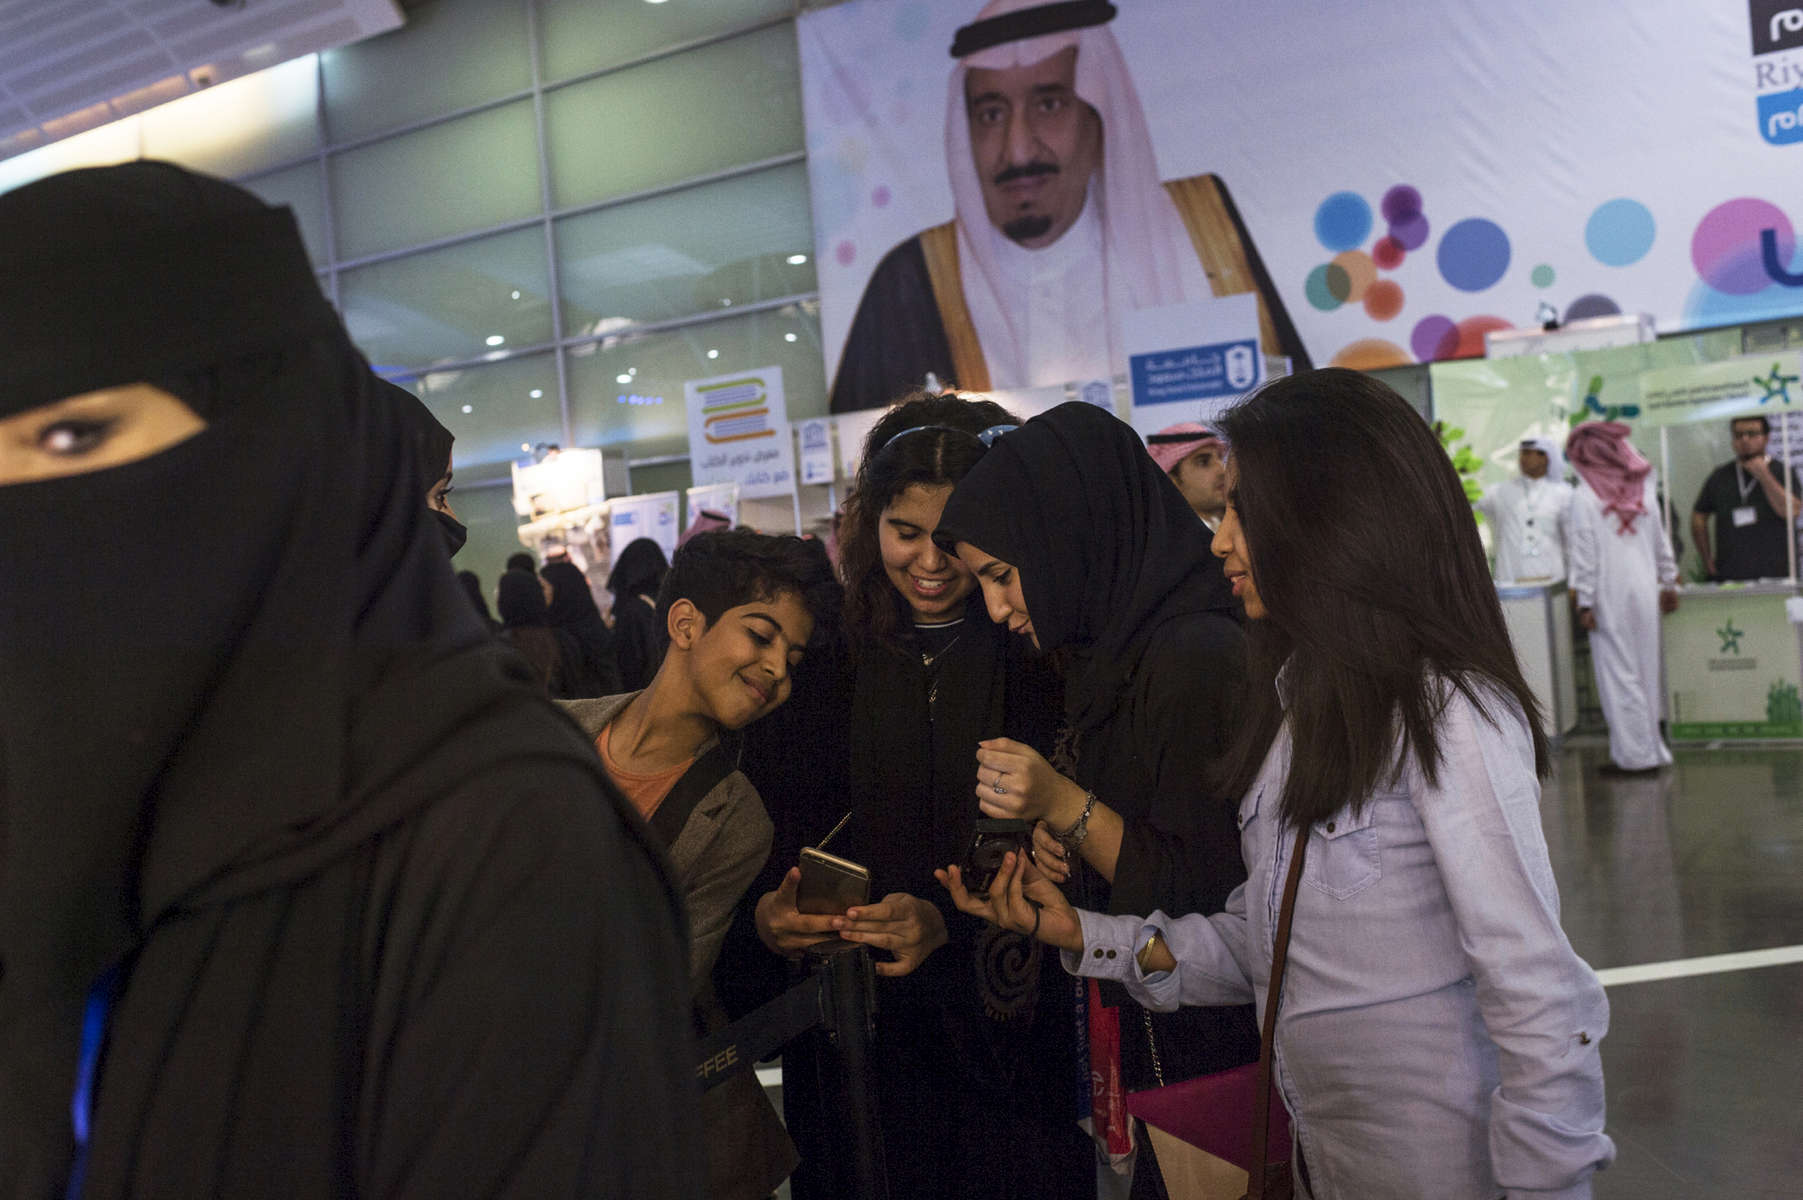 Saudis and foreigners attend the Riyadh Book fair under a banner of Saudi Arabian King Salman at the King Abdullah Conference Center in Riyadh, Saudi Arabia, March 2015.